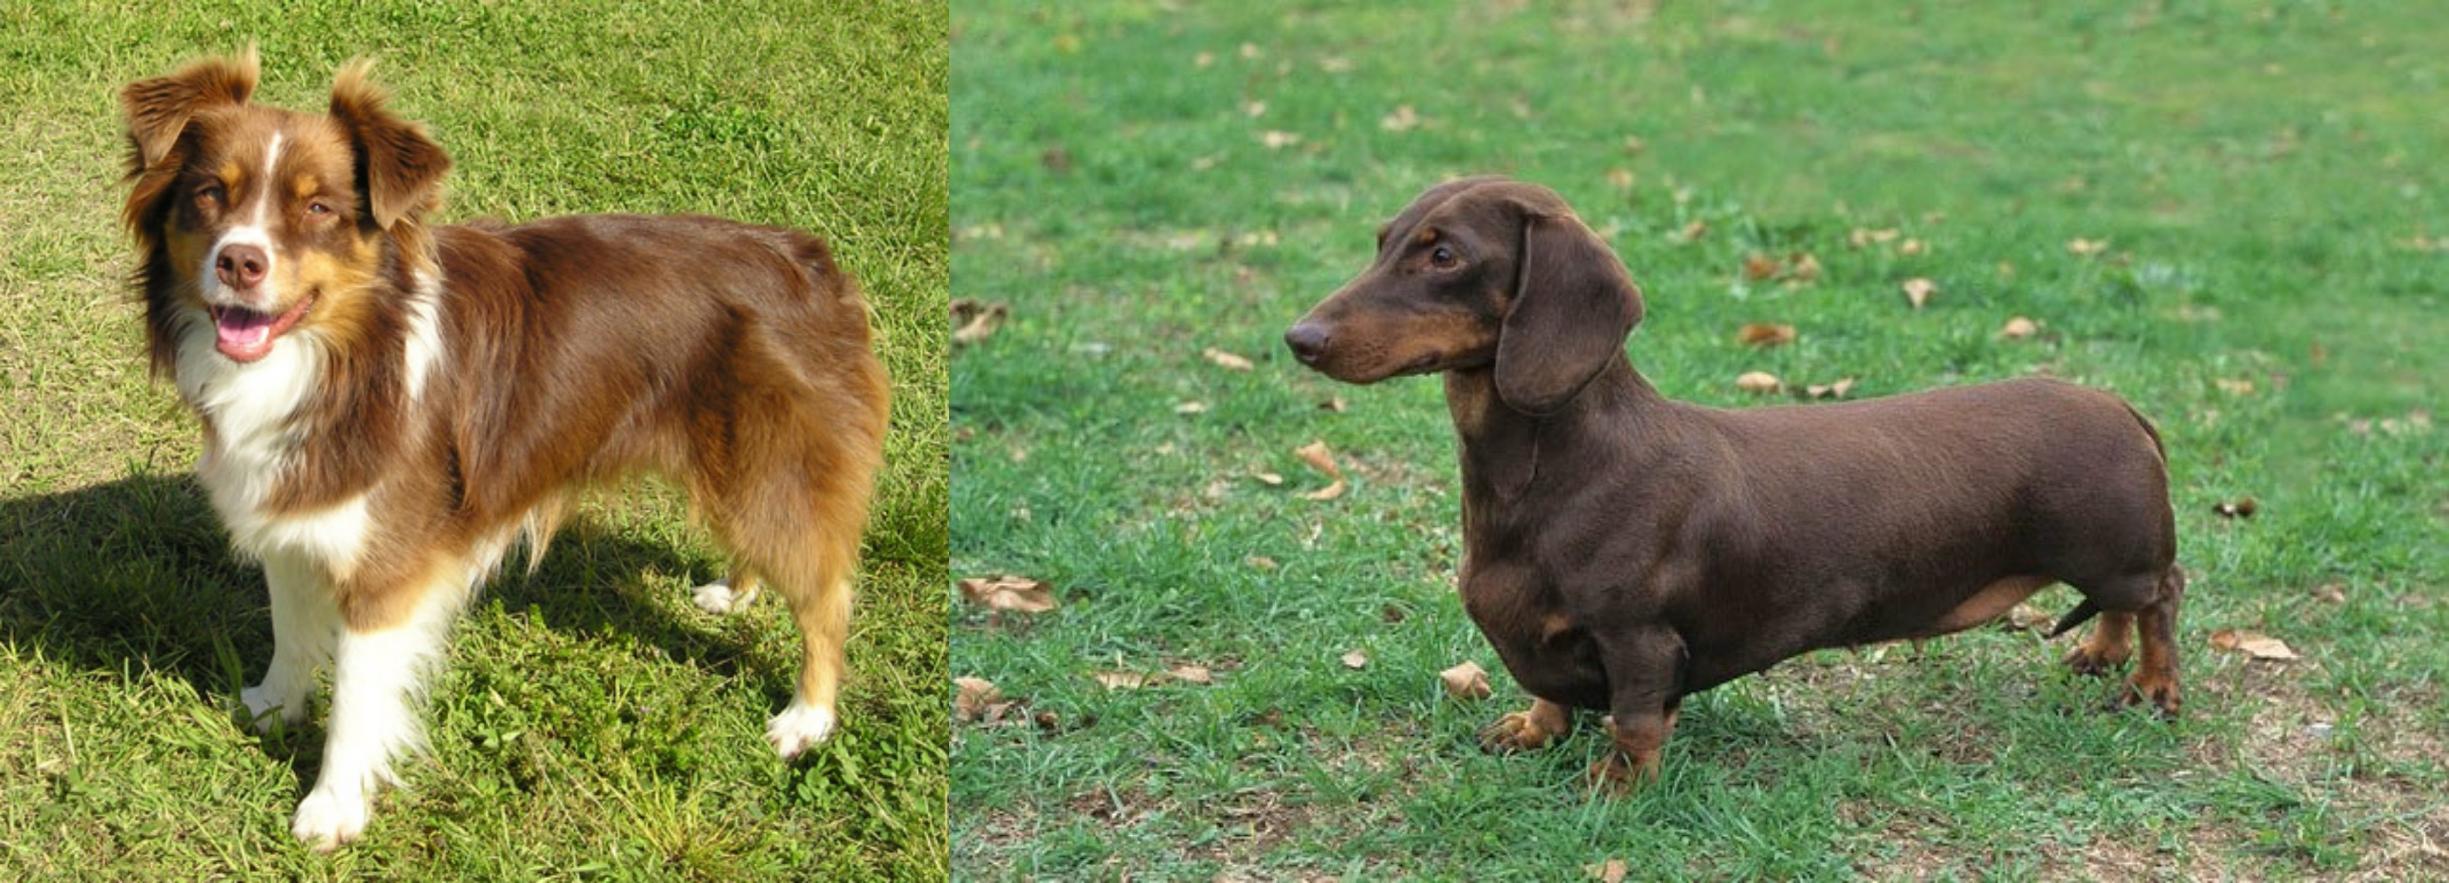 Miniature Australian Shepherd vs Dachshund - Breed Comparison